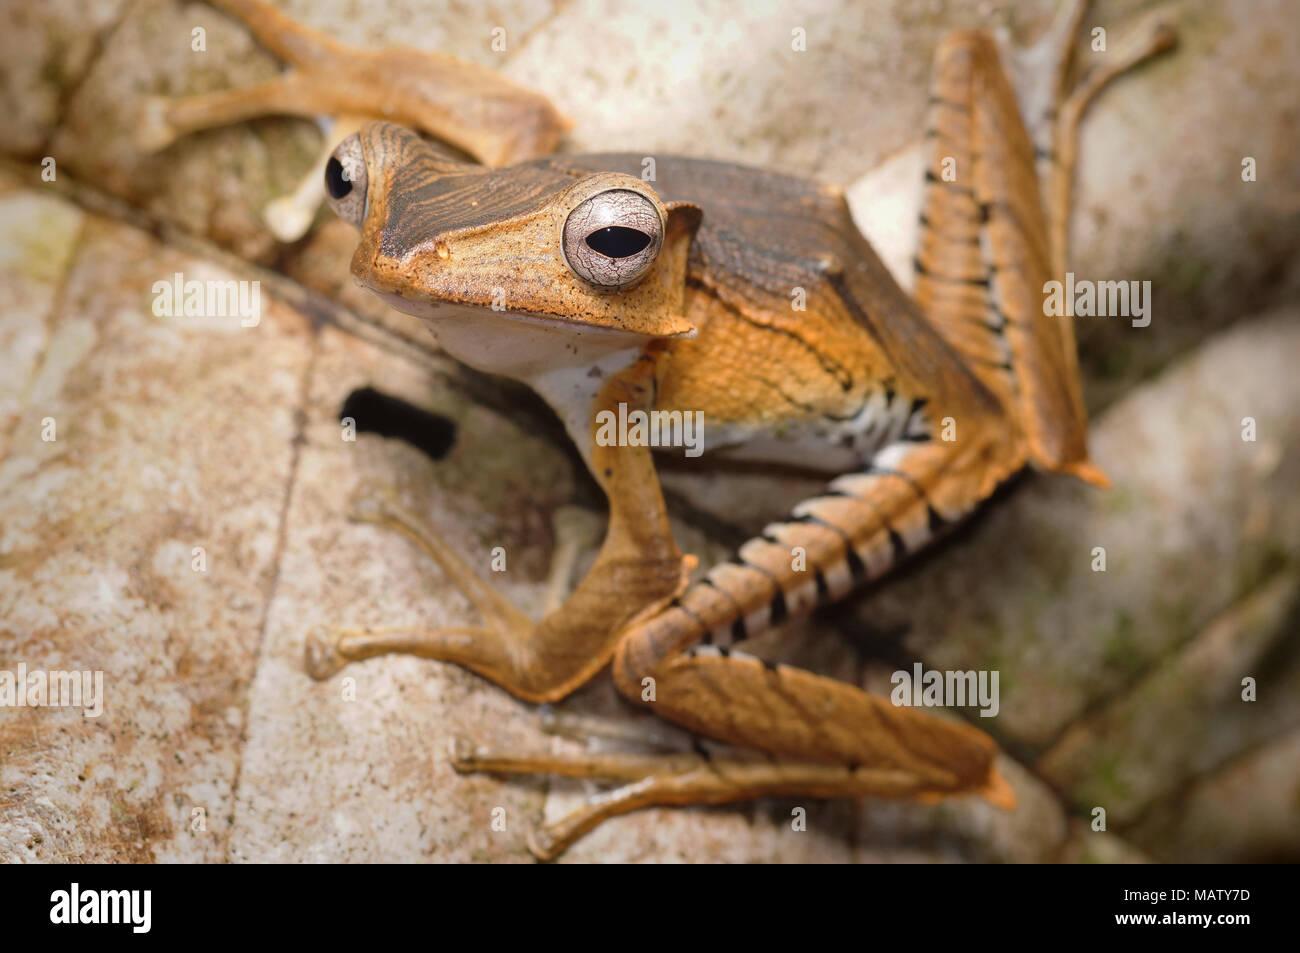 File eared frog Polypedates otilophus - Stock Image